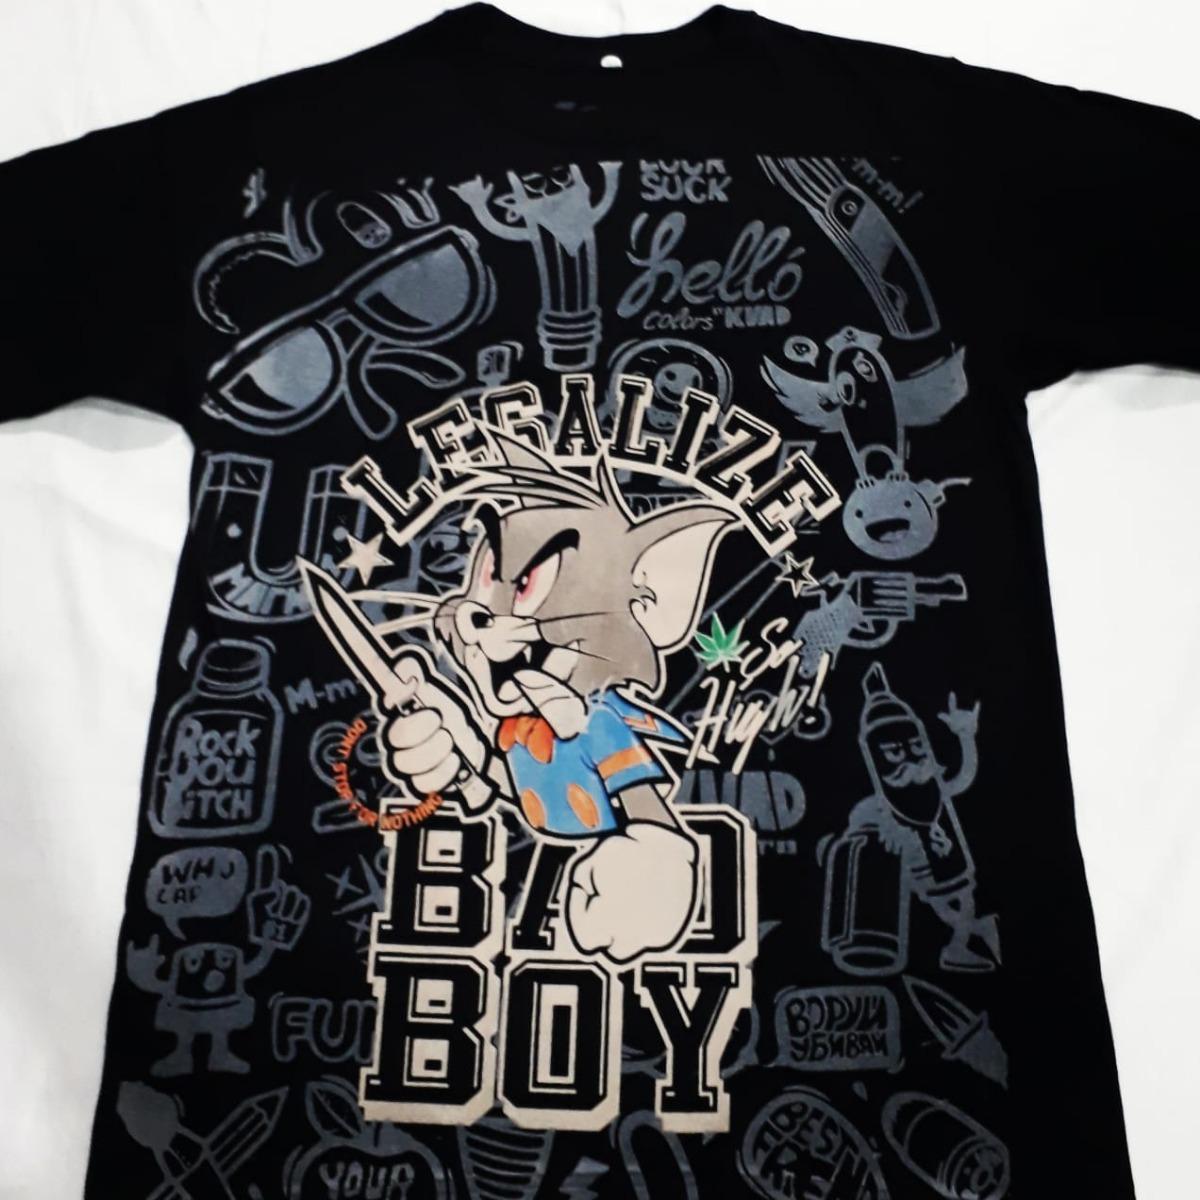 e2f938f141847 camiseta hombre moda urbana ropa estilo hip hop street 0004. Cargando zoom.